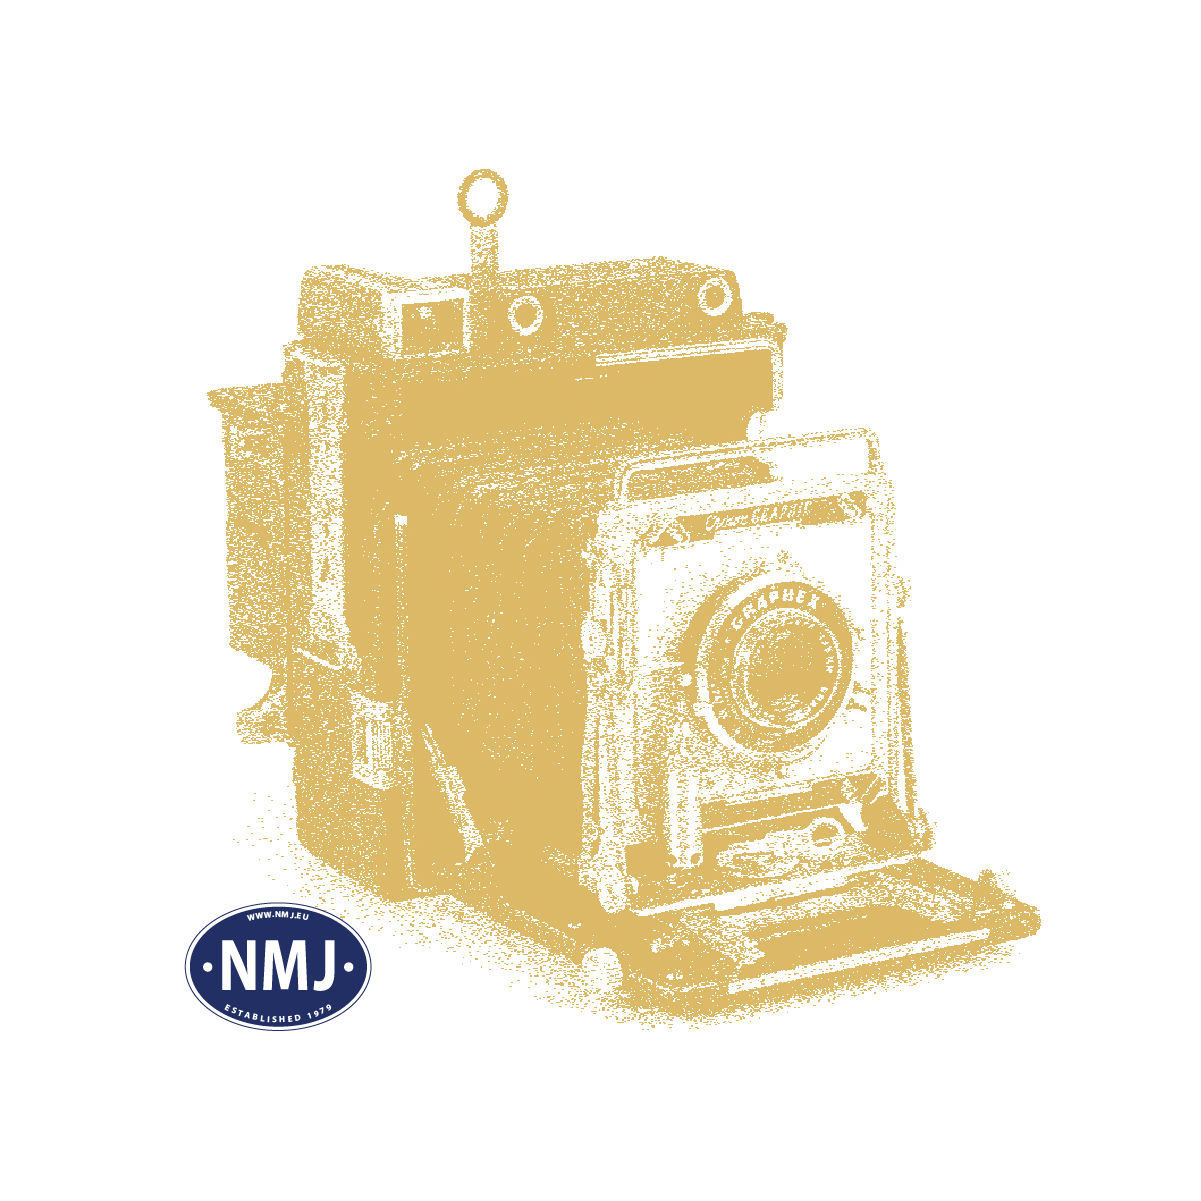 NMJT95401 - NMJ Topline SNCB 202020, AC Digital